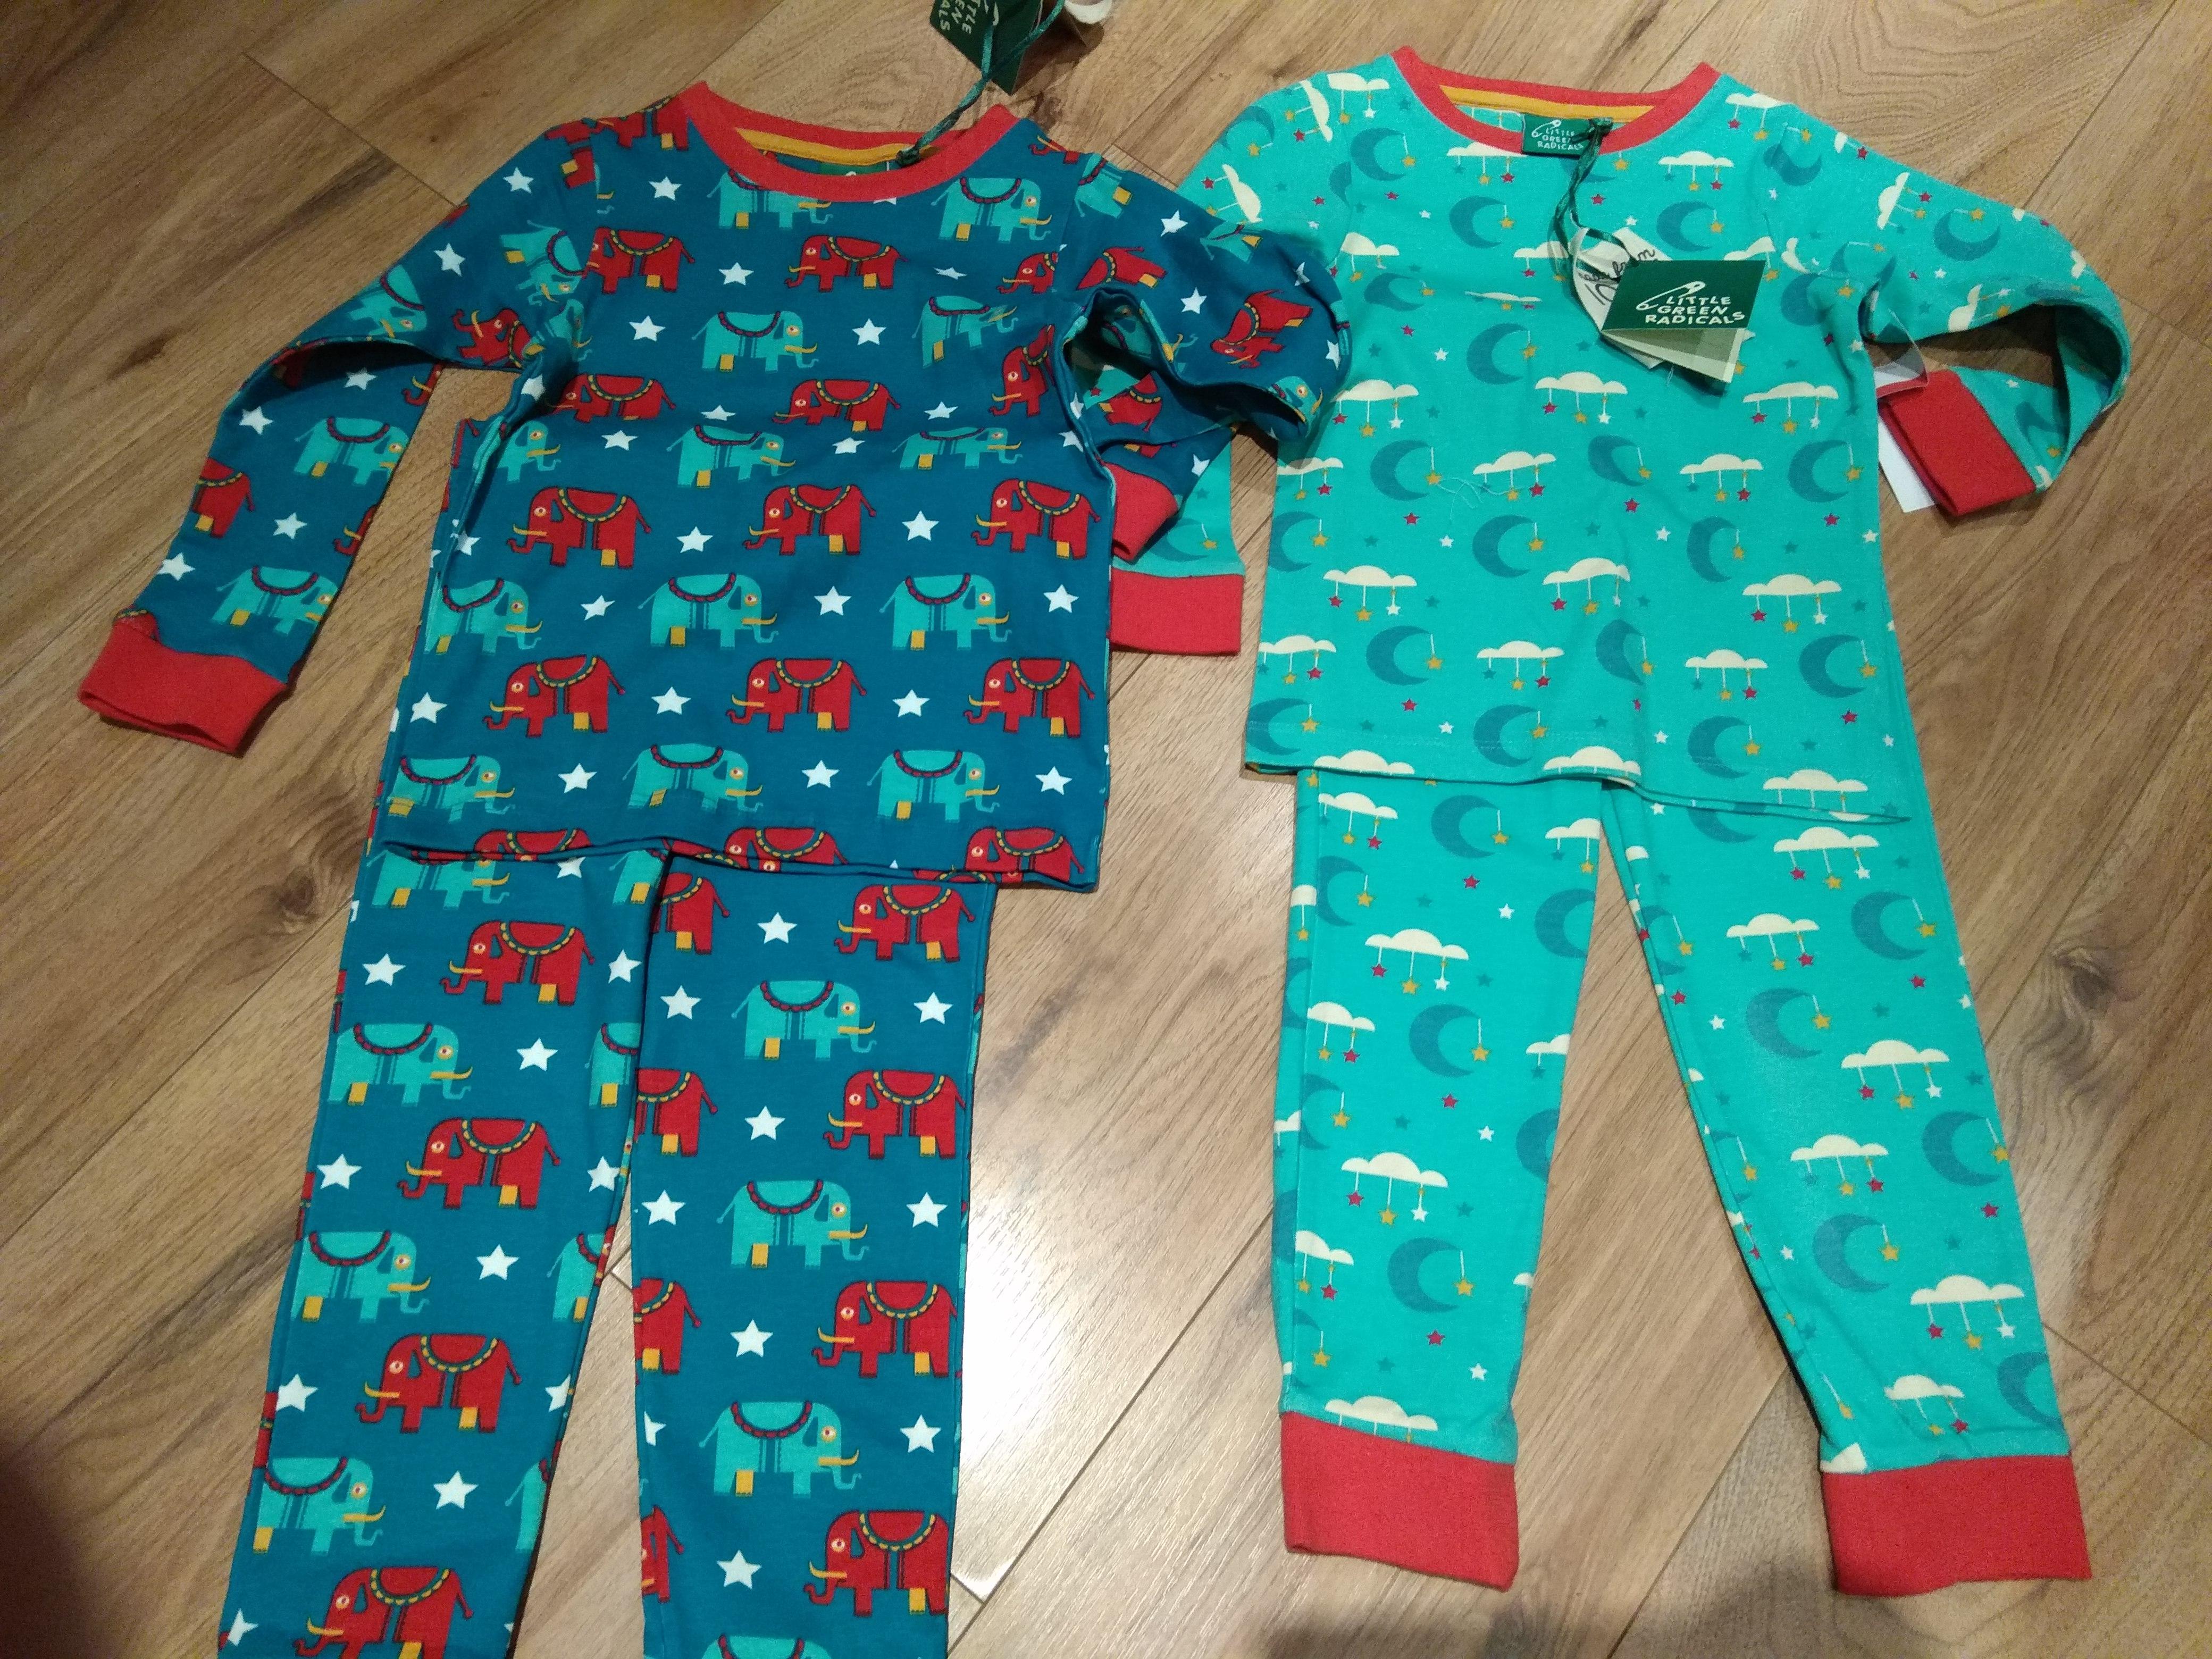 TK Maxx Little Green Radicals Kids Organic Cotton Pyjamas £9.99